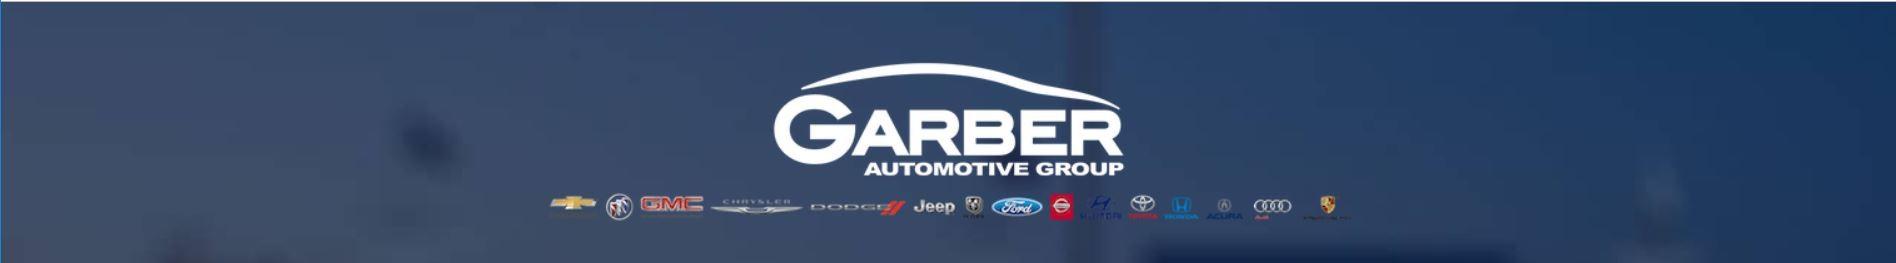 Garber Auto Mall >> Garber Automotive Group Linkedin